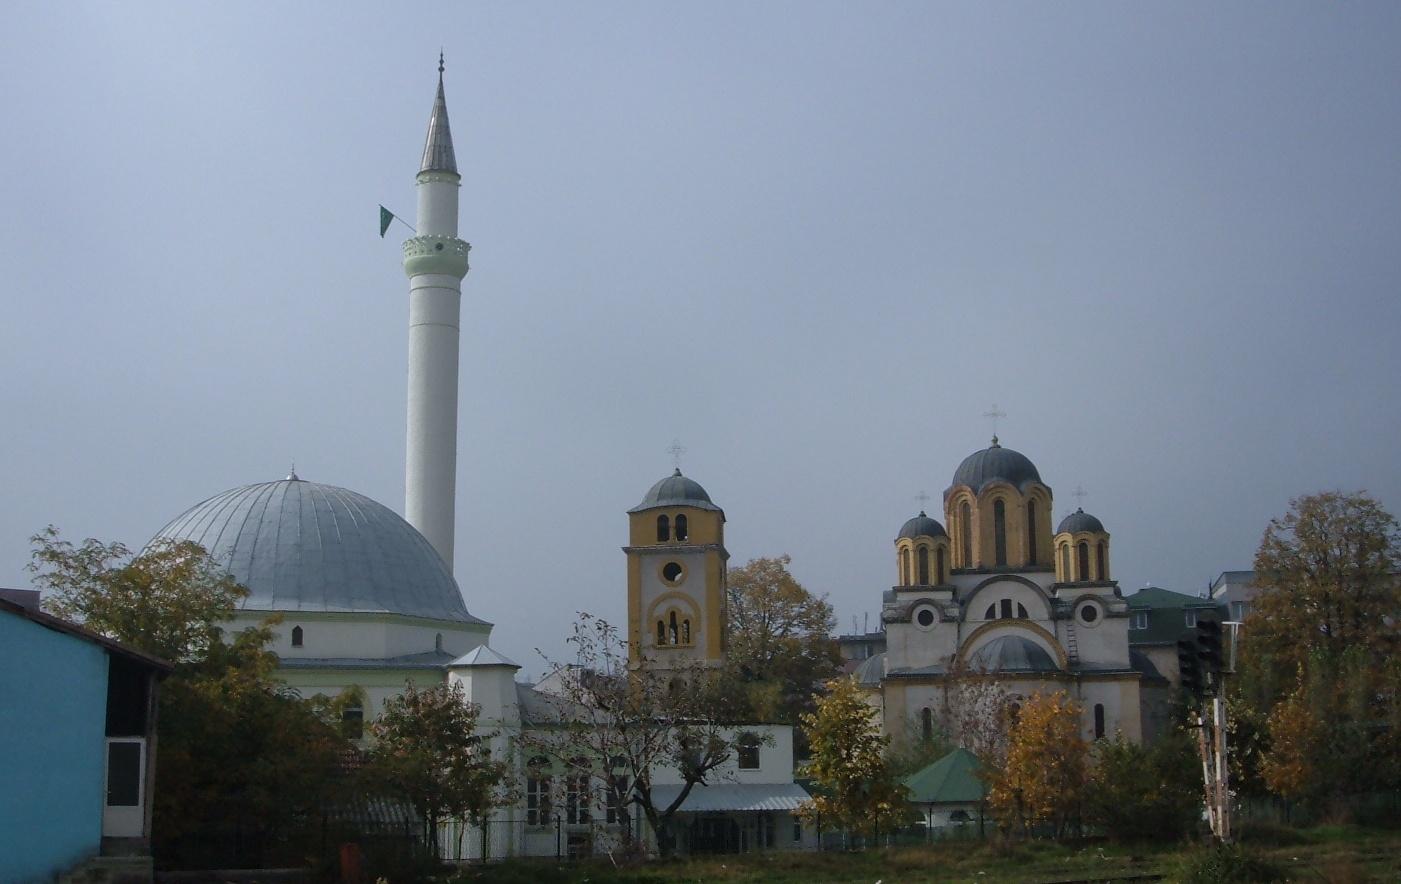 05 Moschee langa o biserica catolica in orasul kosovar Ferizai zis si Urosevac